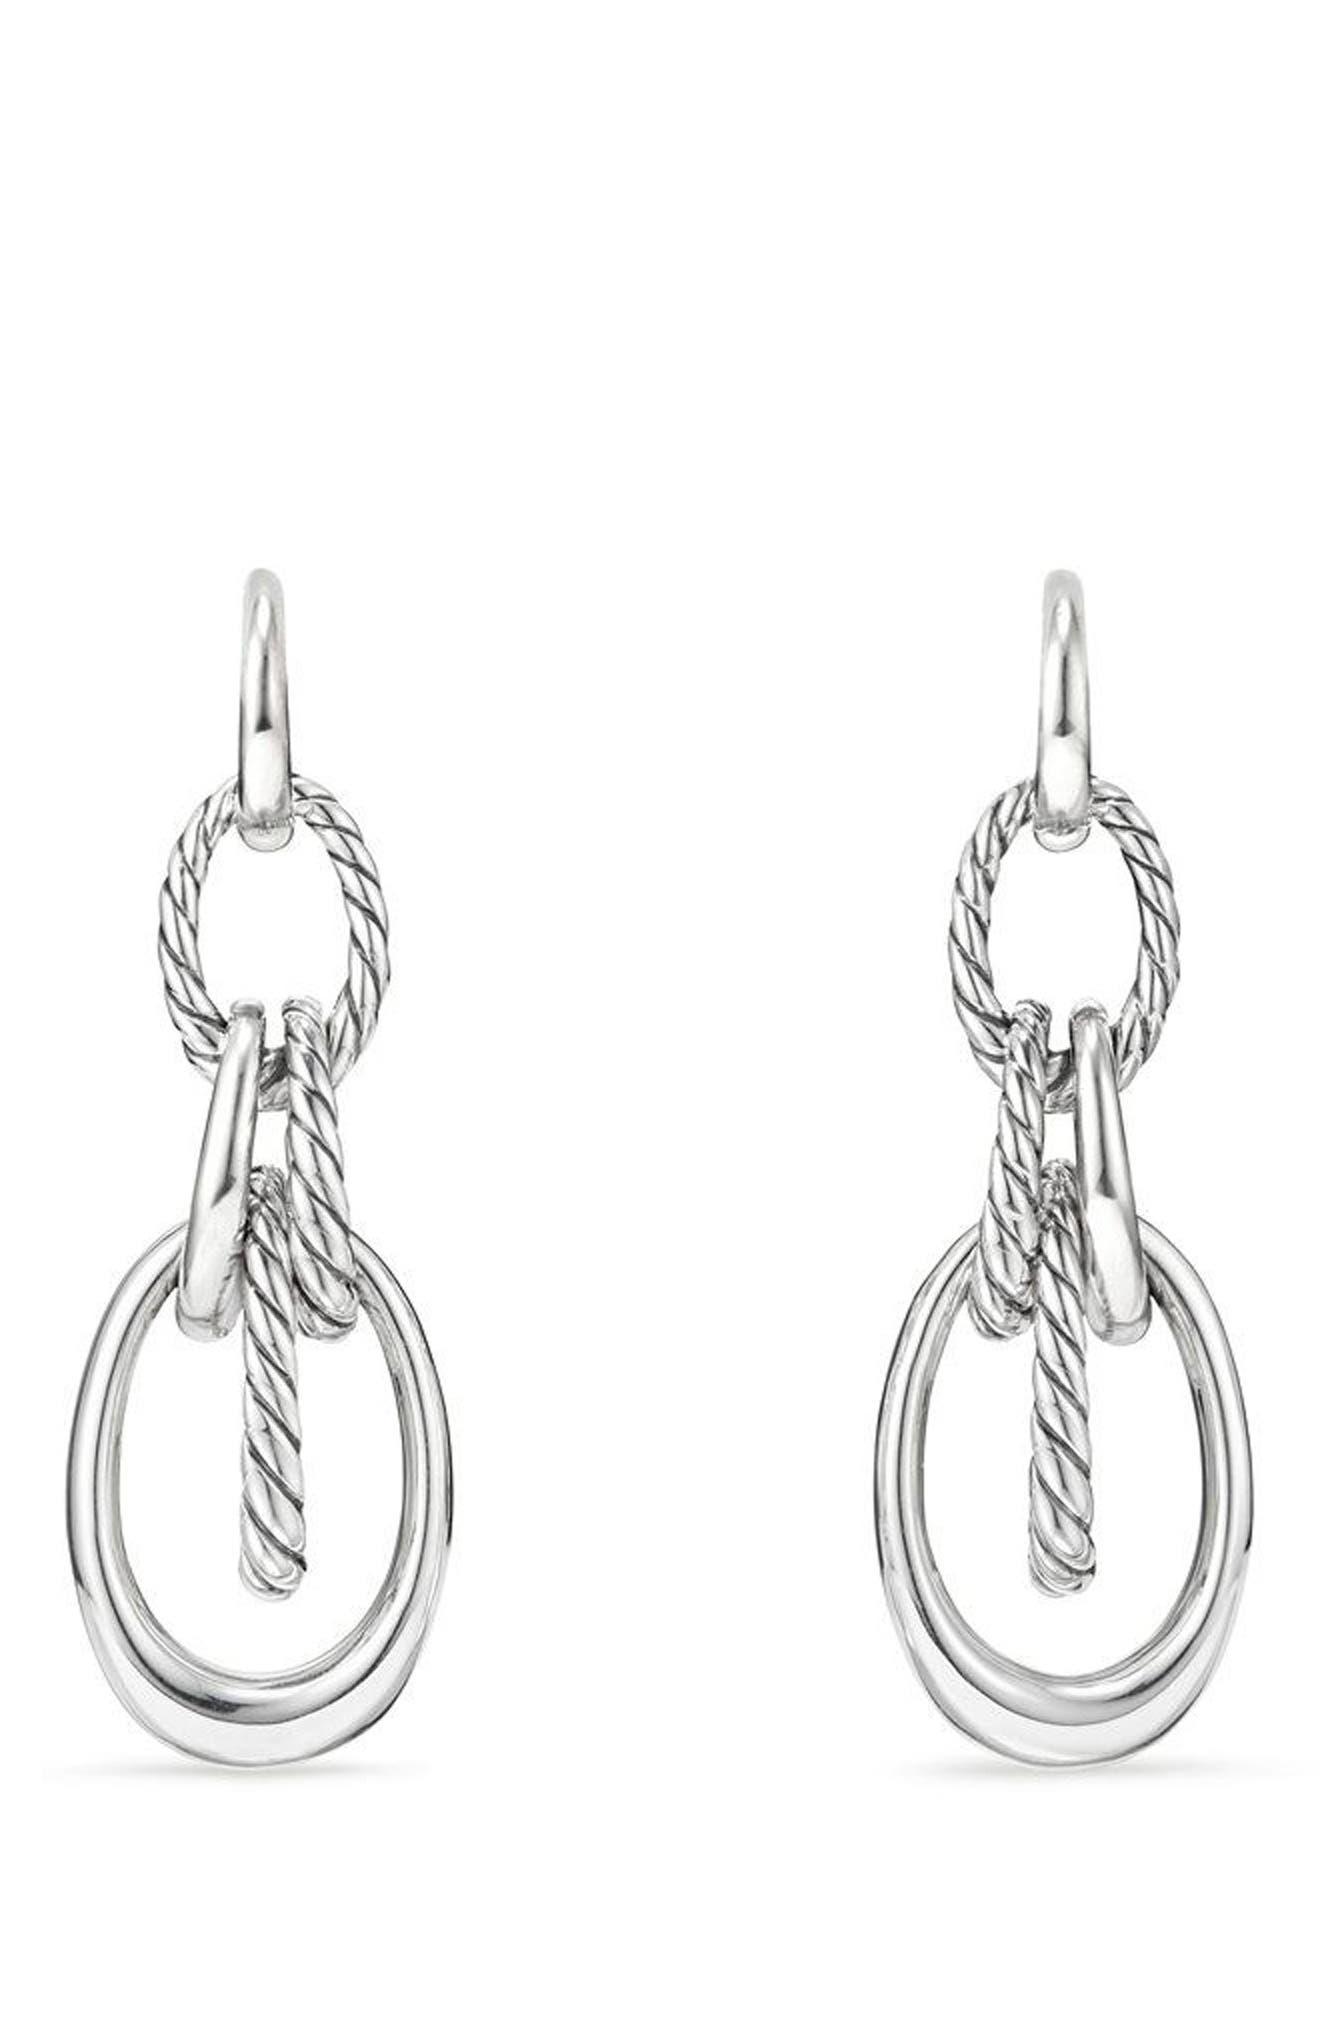 Pure Form<sup>®</sup> Drop Earrings,                             Main thumbnail 1, color,                             SILVER/ DIAMOND